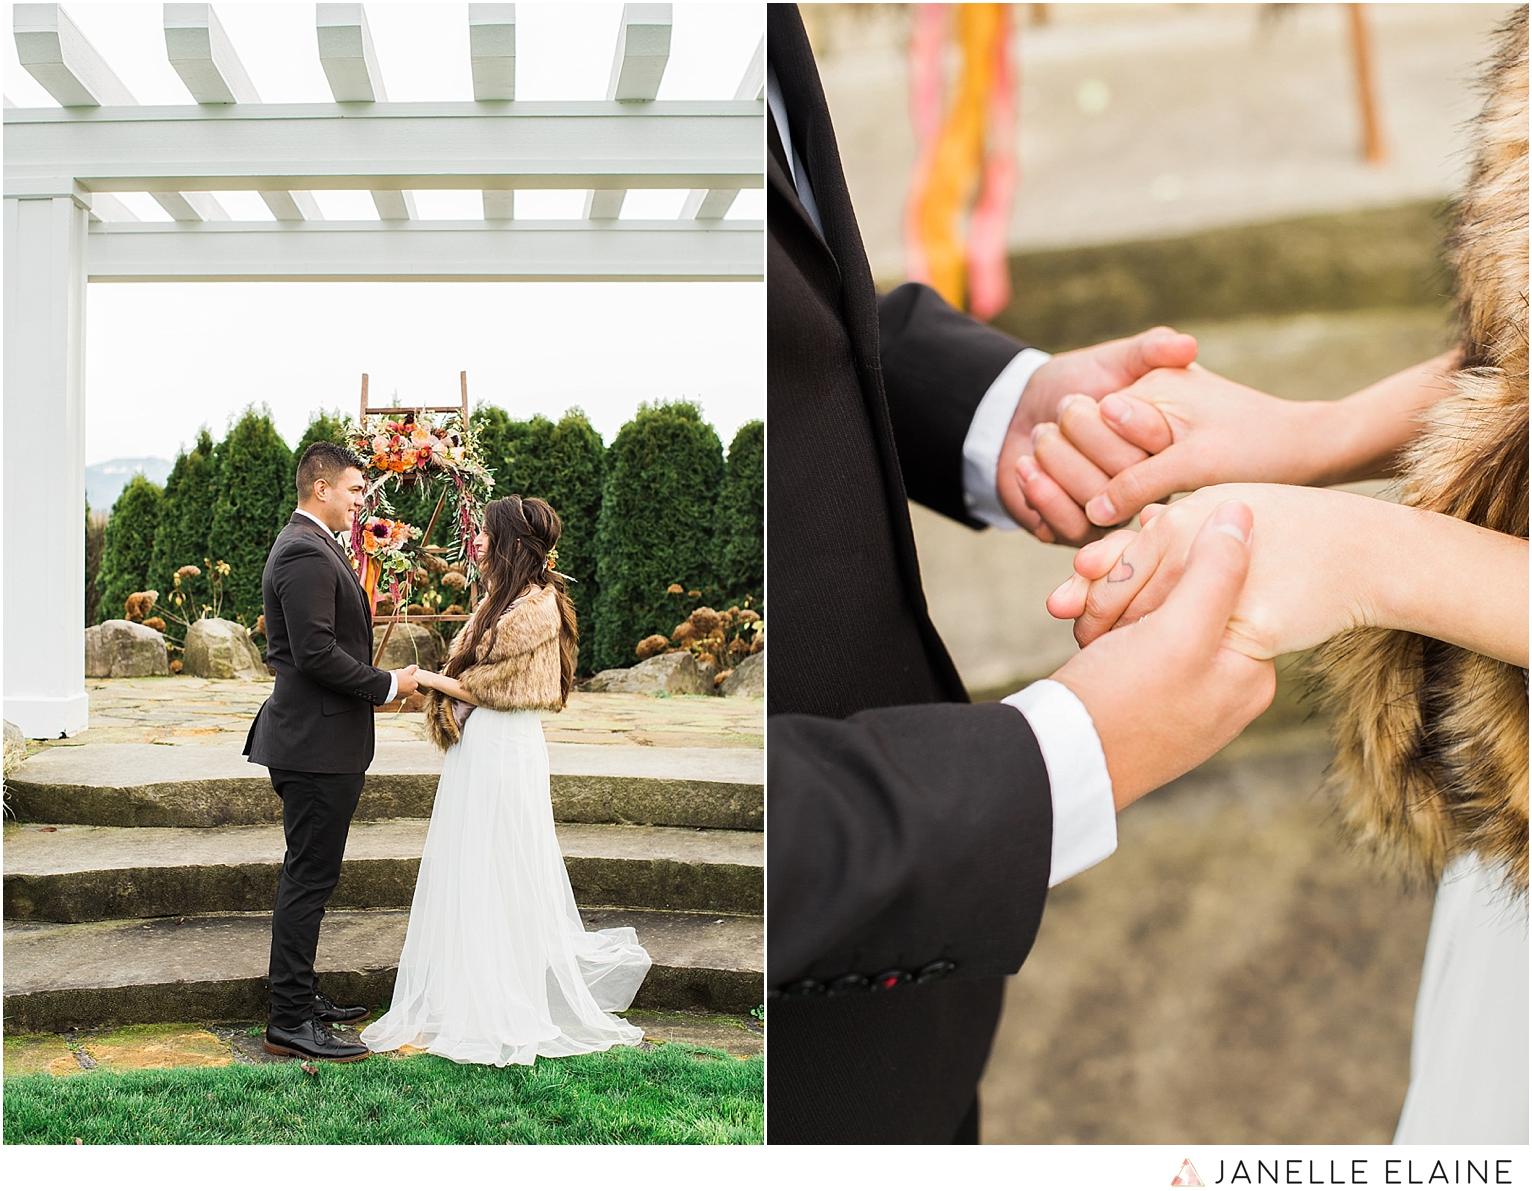 elopement-wedding-photographer-seattle washington-photographers-84.jpg